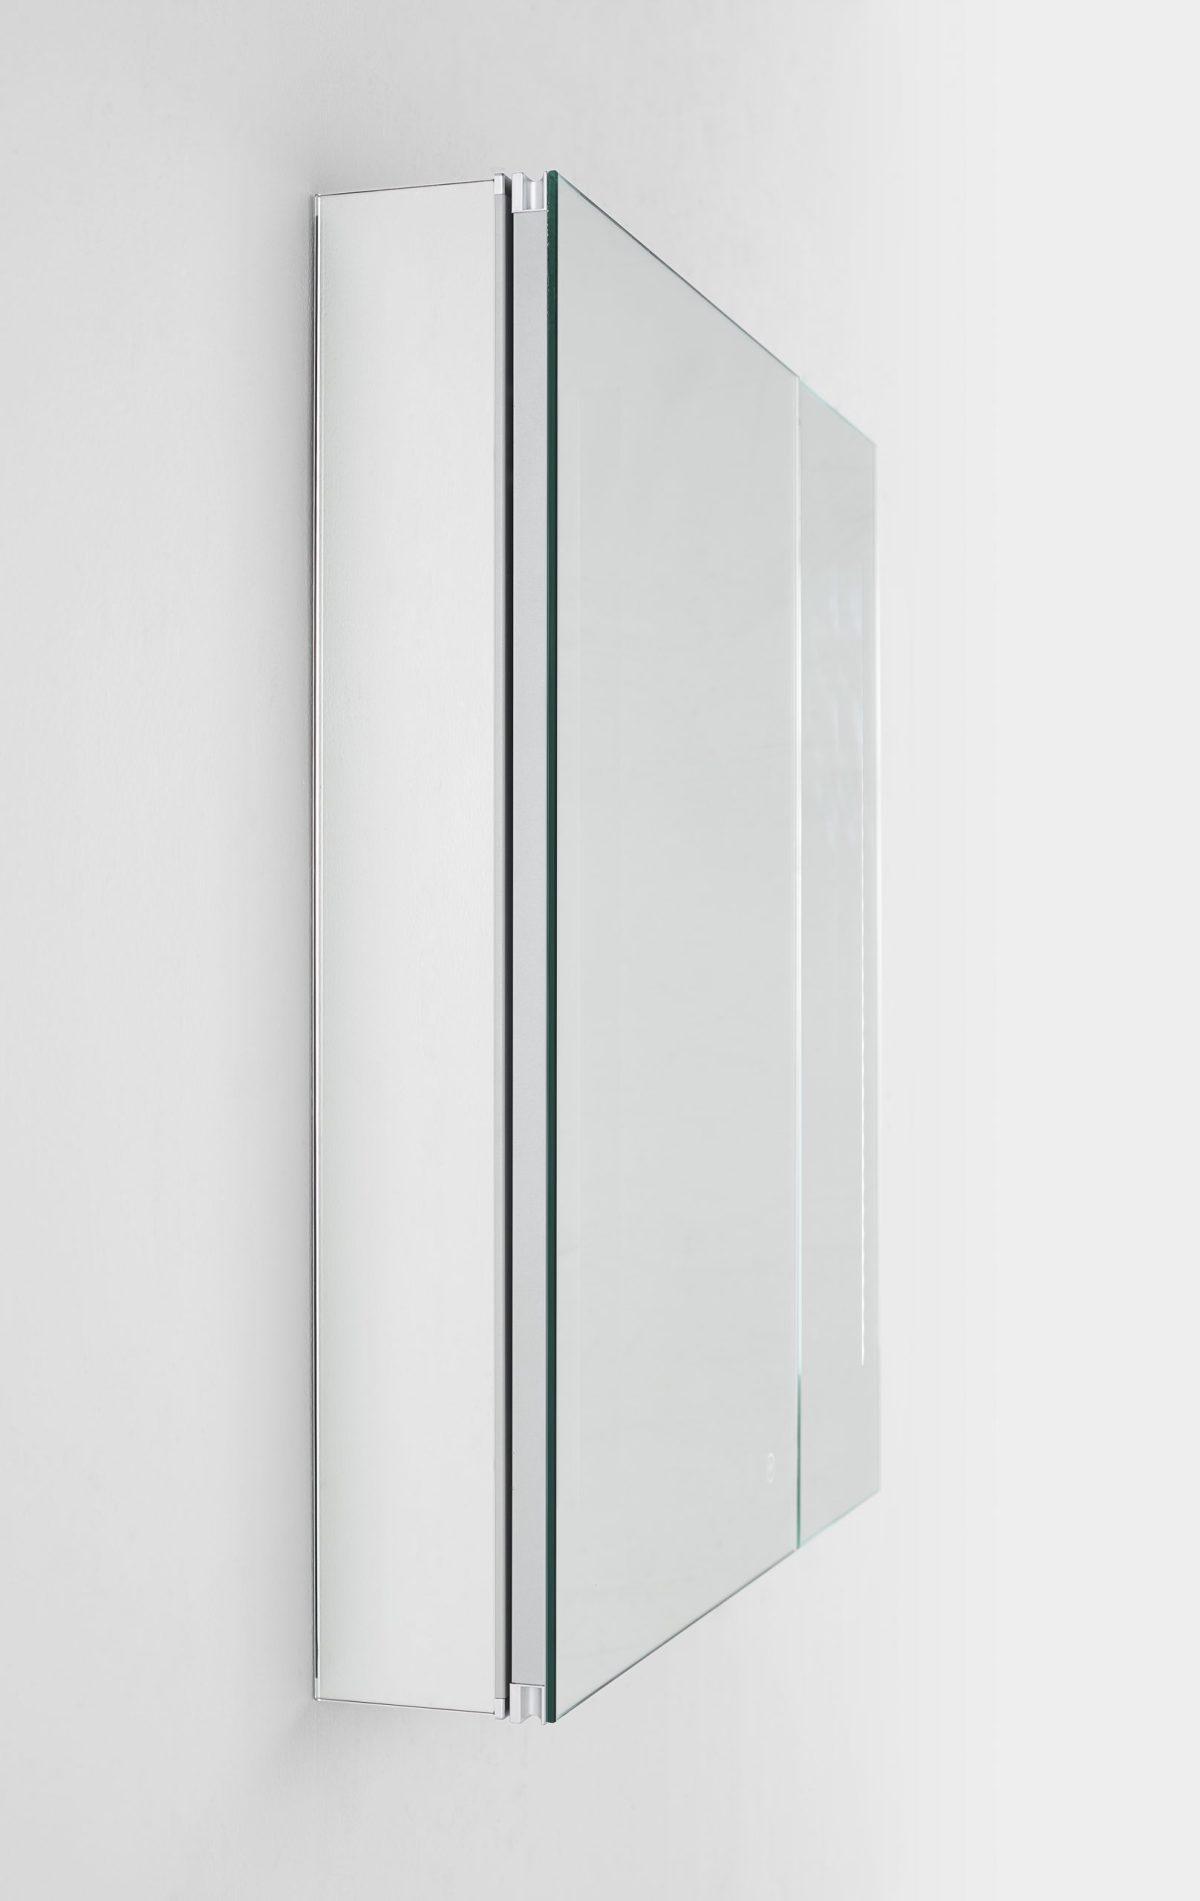 AQUADOM Royale 24 inches x 30 inches Medicine Mirror Glass Cabinet for Bathroom